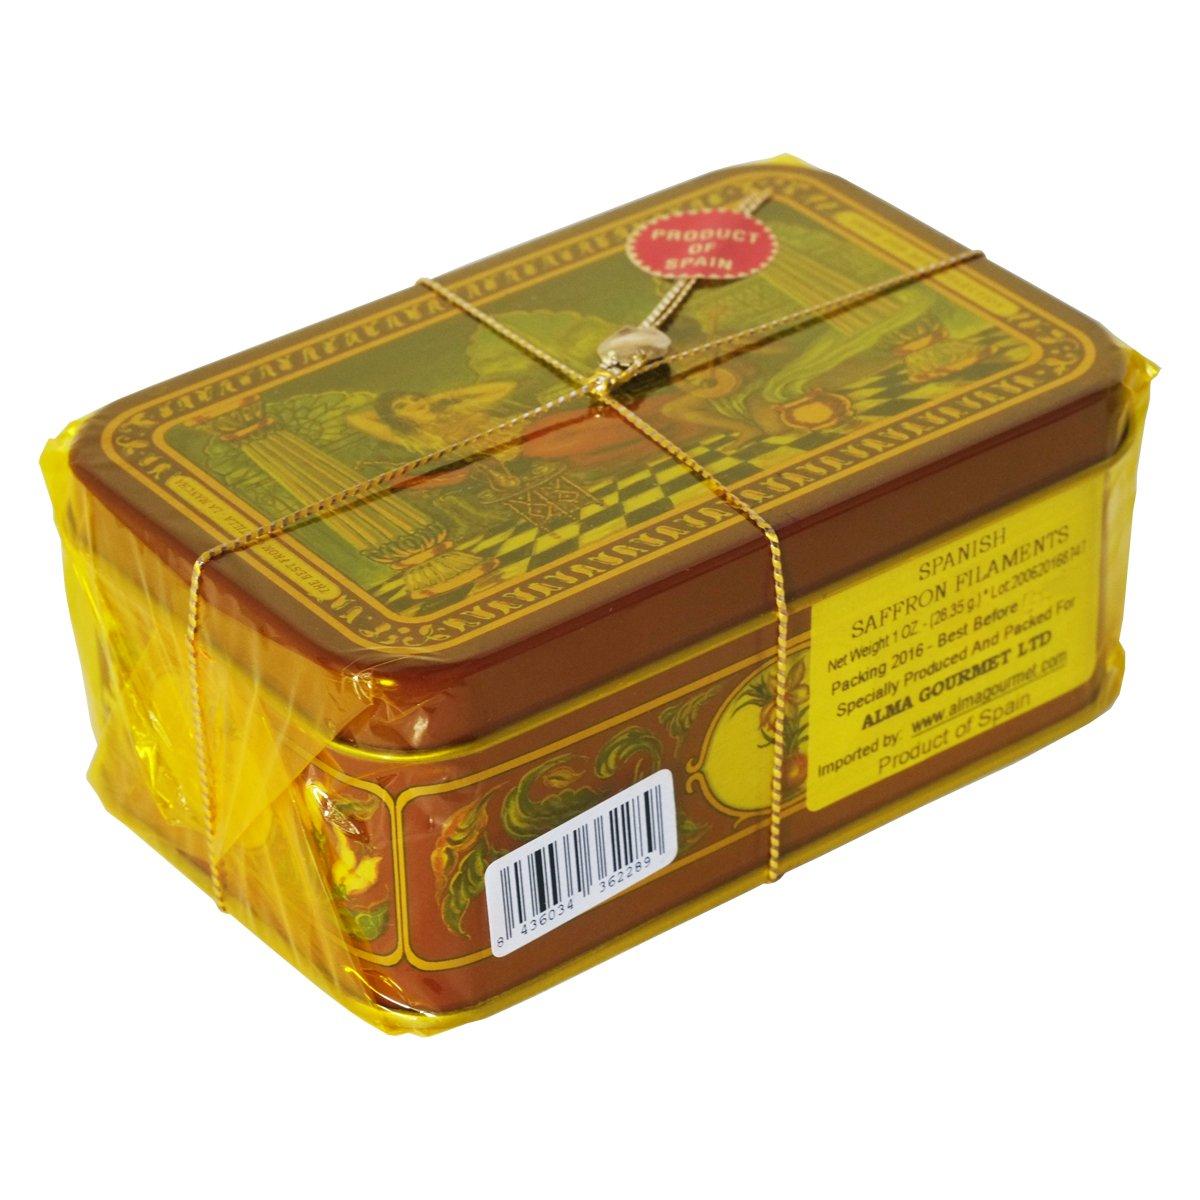 Spanish Saffron 1 Oz Tin